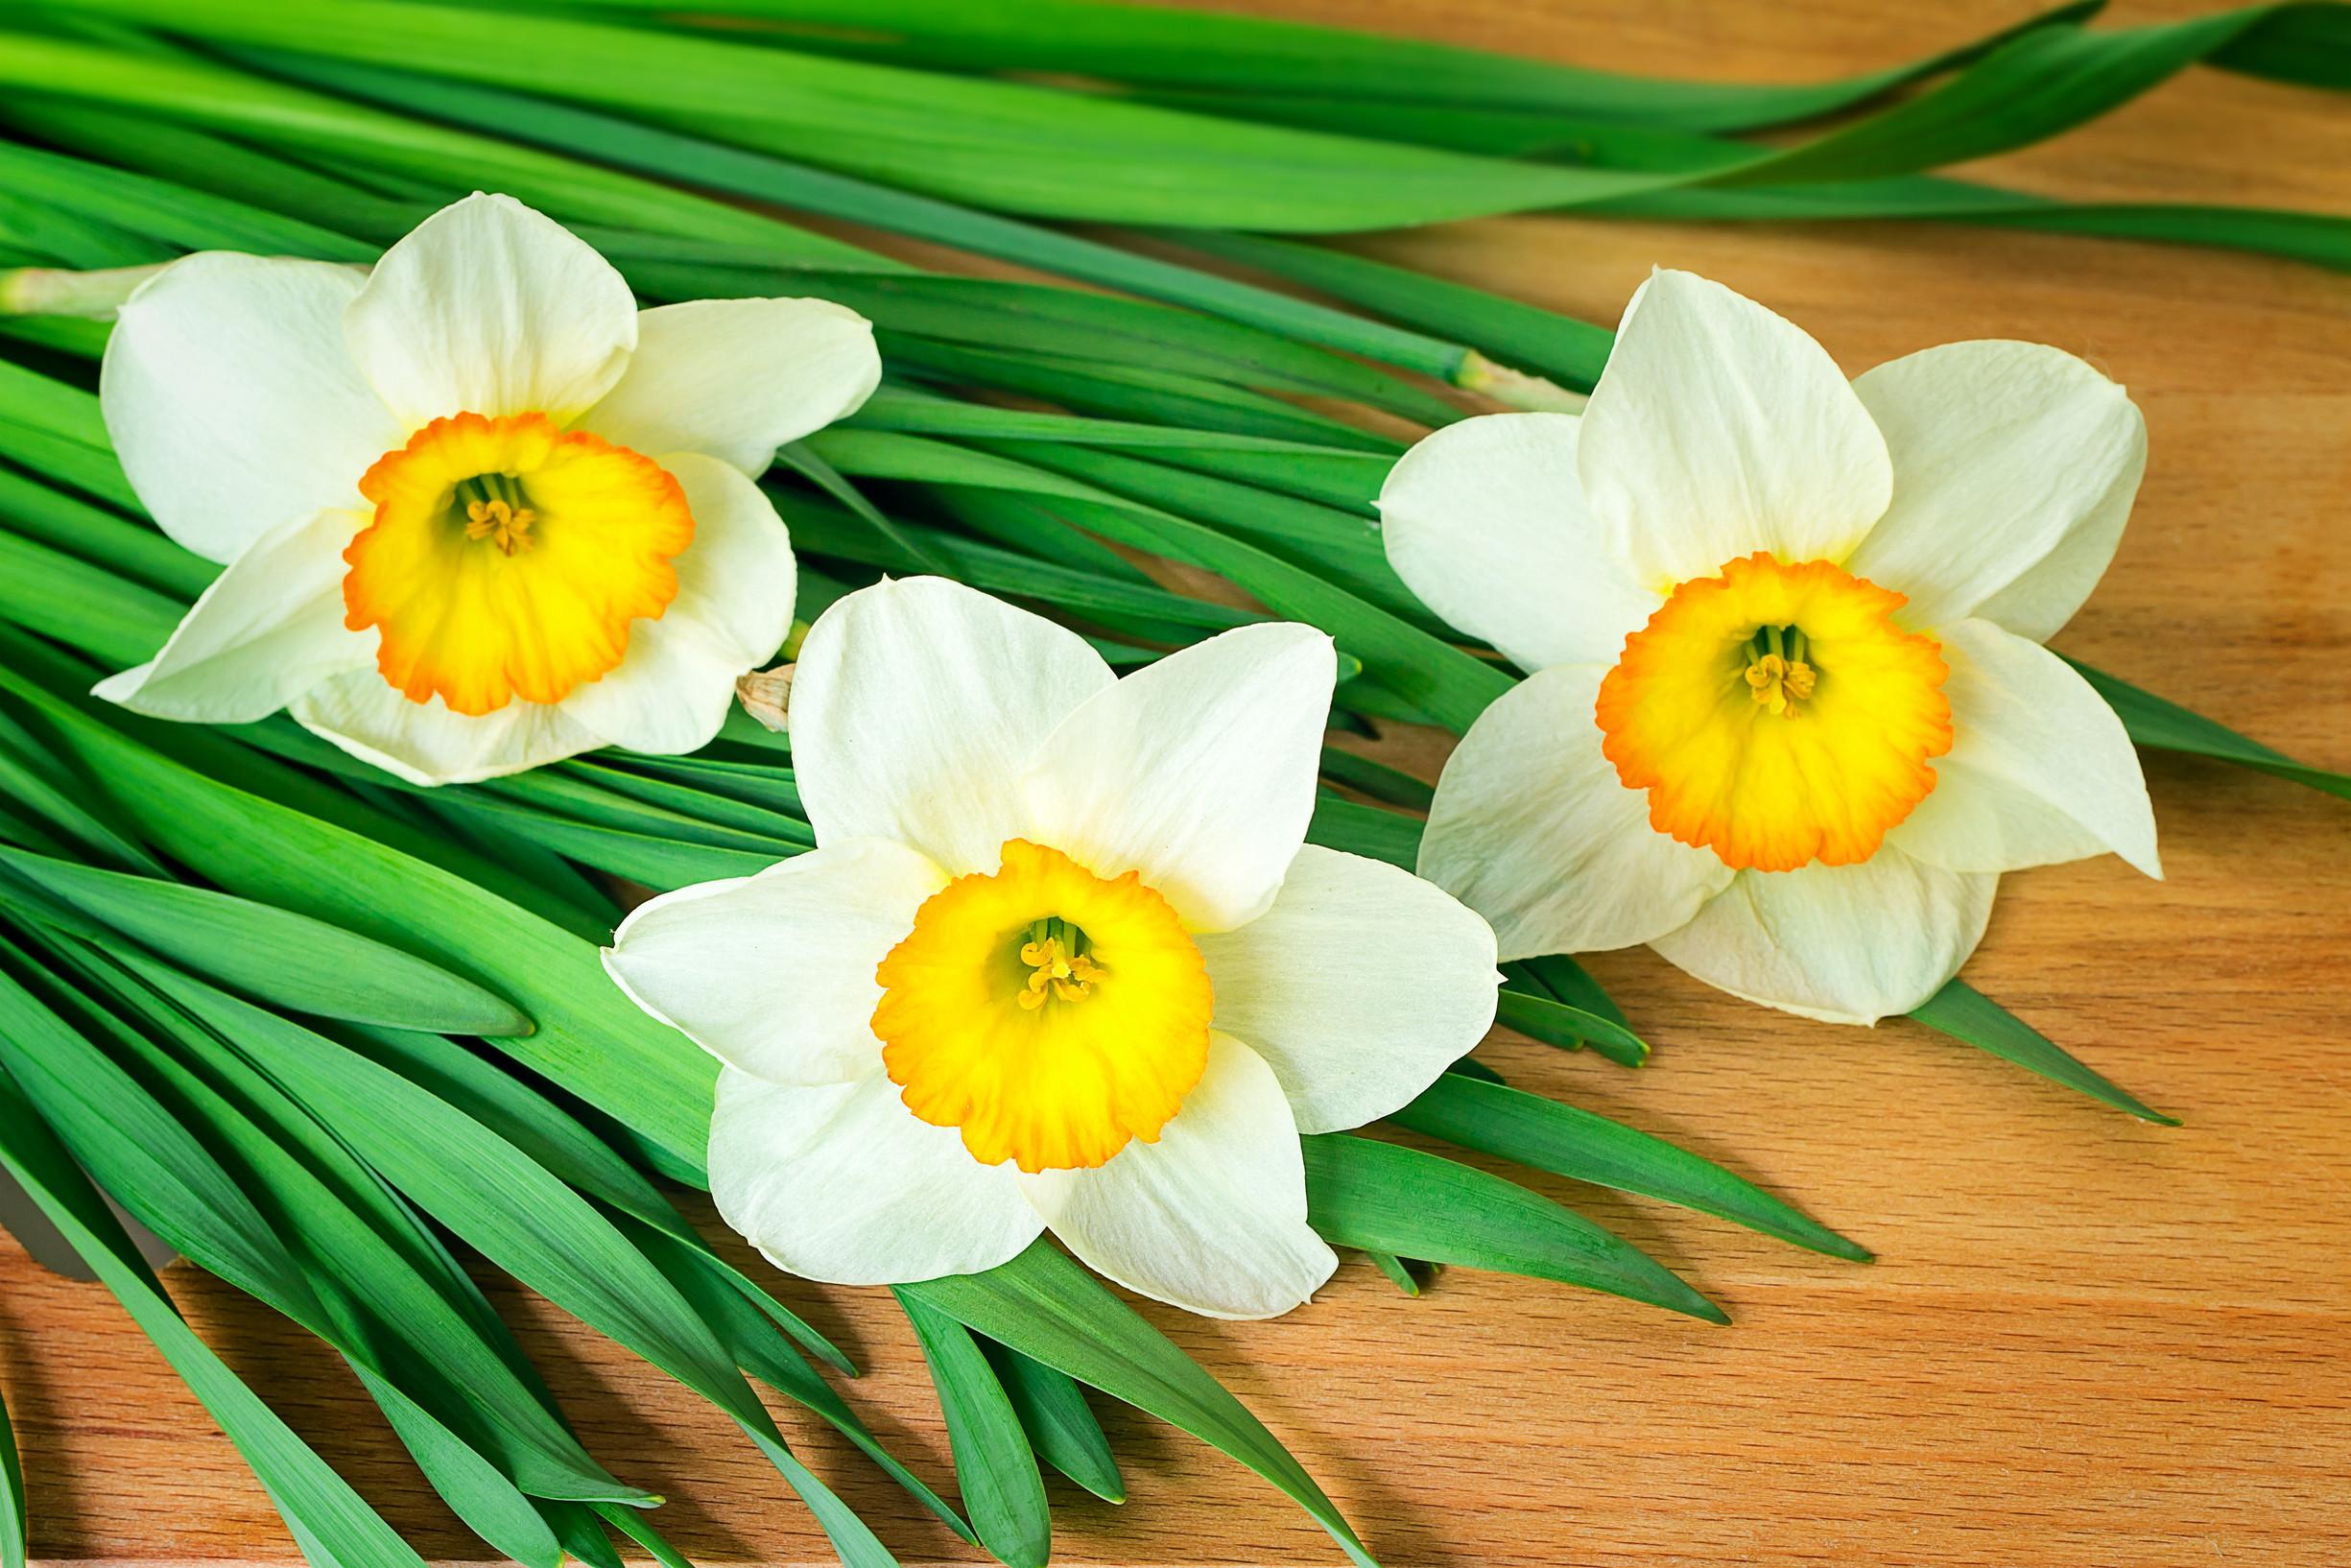 Цветы комнатные по знаку зодиака близнецы фото